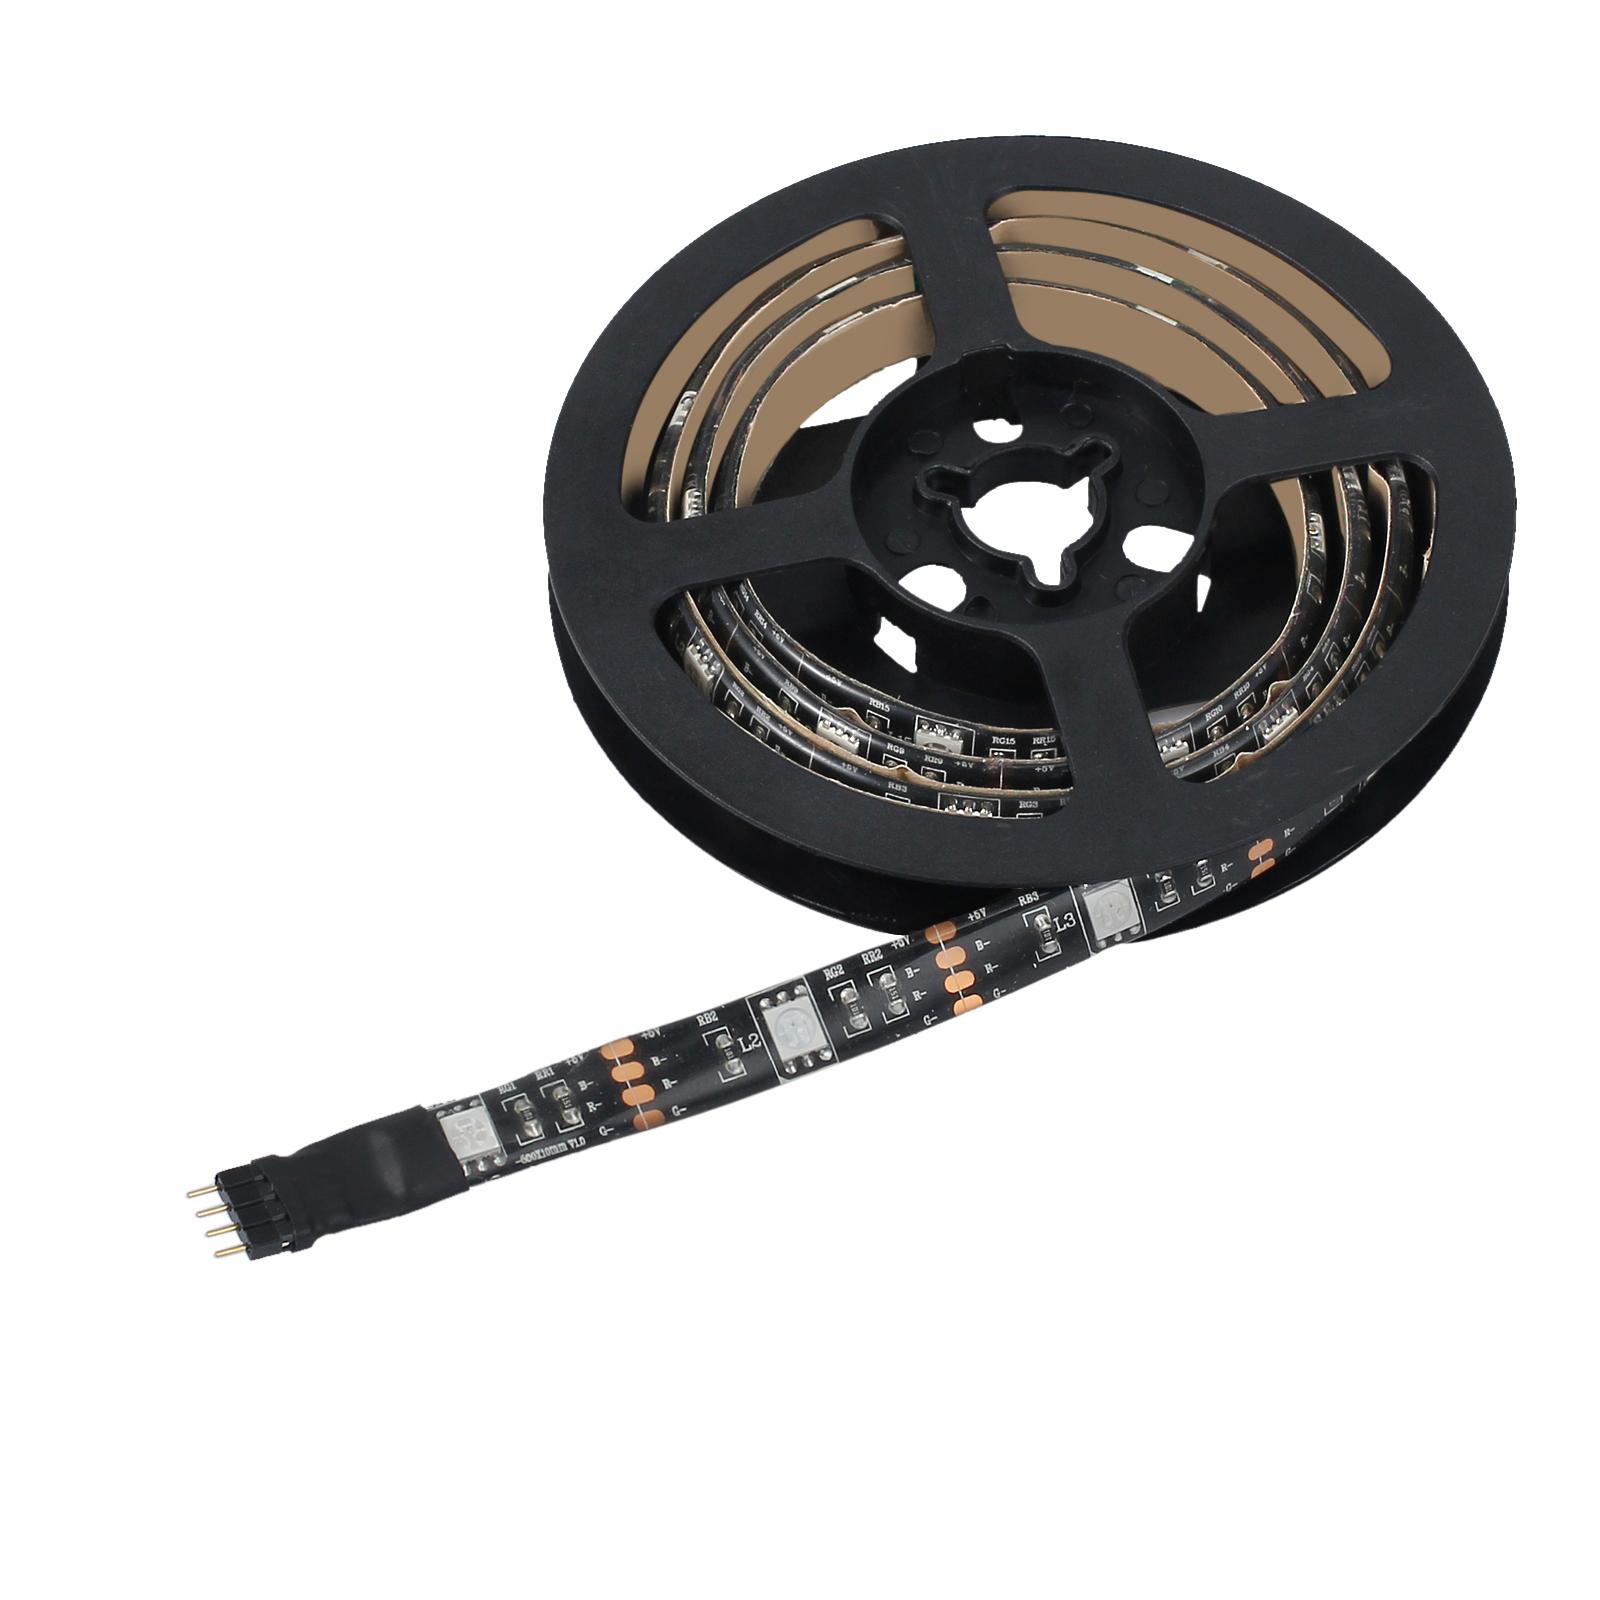 led usb backlight tv hintergrund beleuchtung licht band stripes streifen 30x rgb ebay. Black Bedroom Furniture Sets. Home Design Ideas